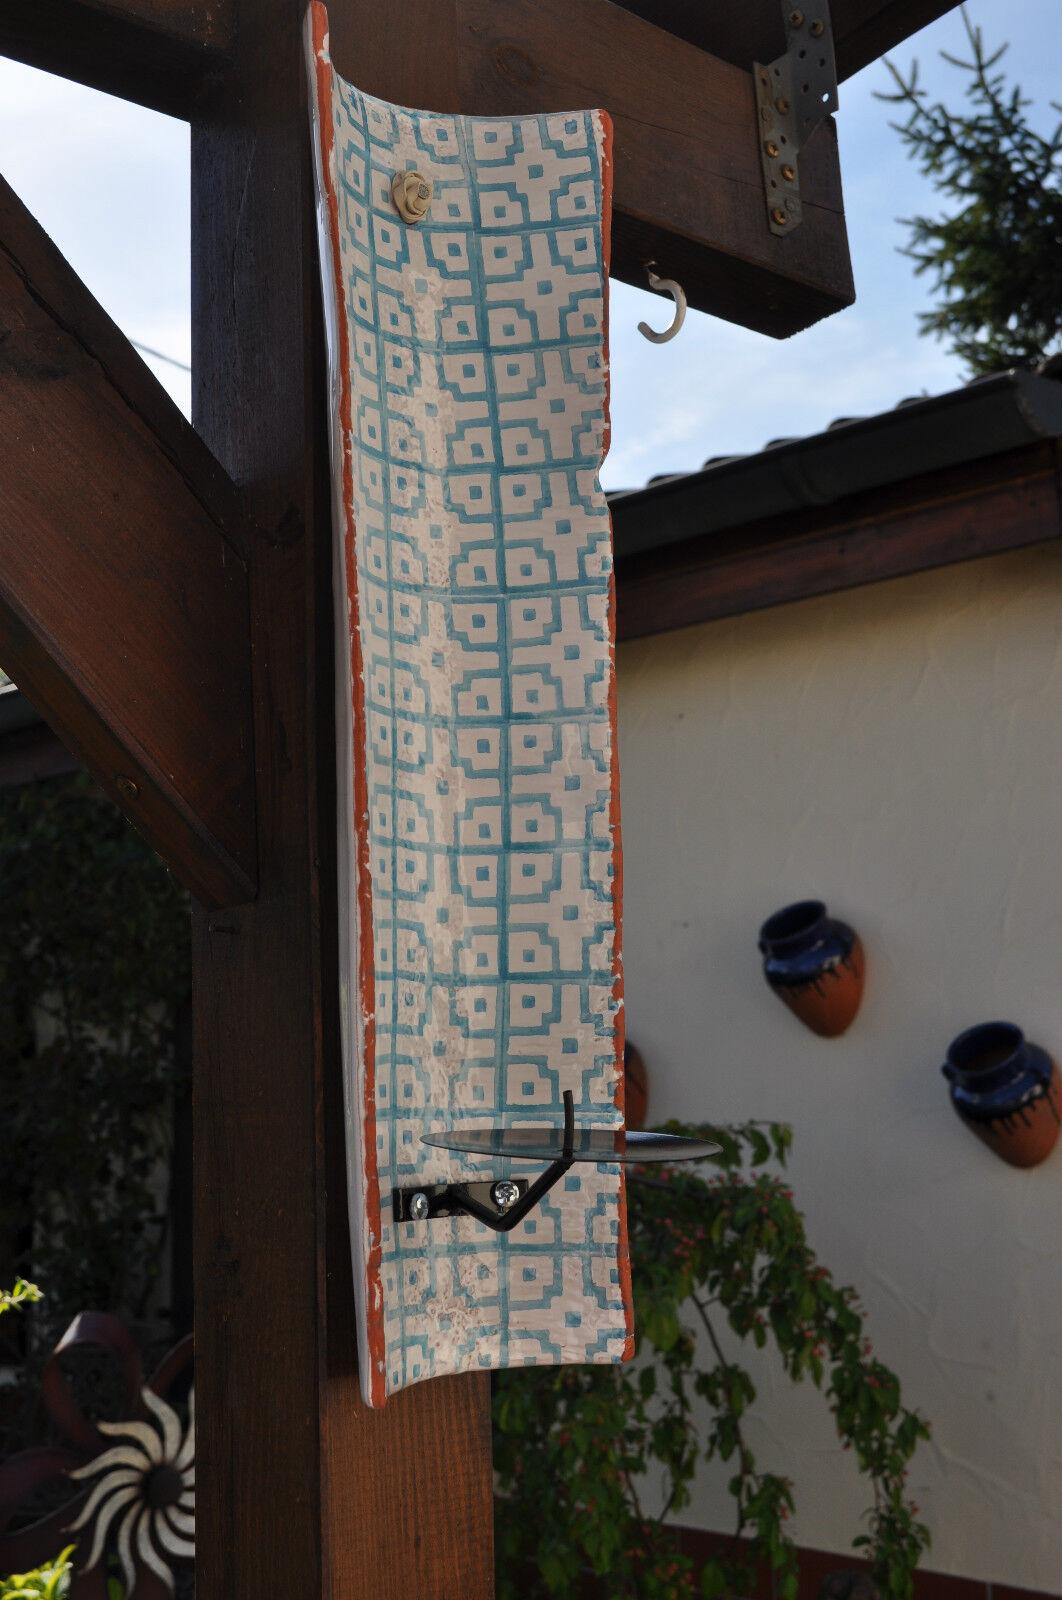 Candeleros muro barro cocido ethno wandkachel azul cerámica a mano, Pomax